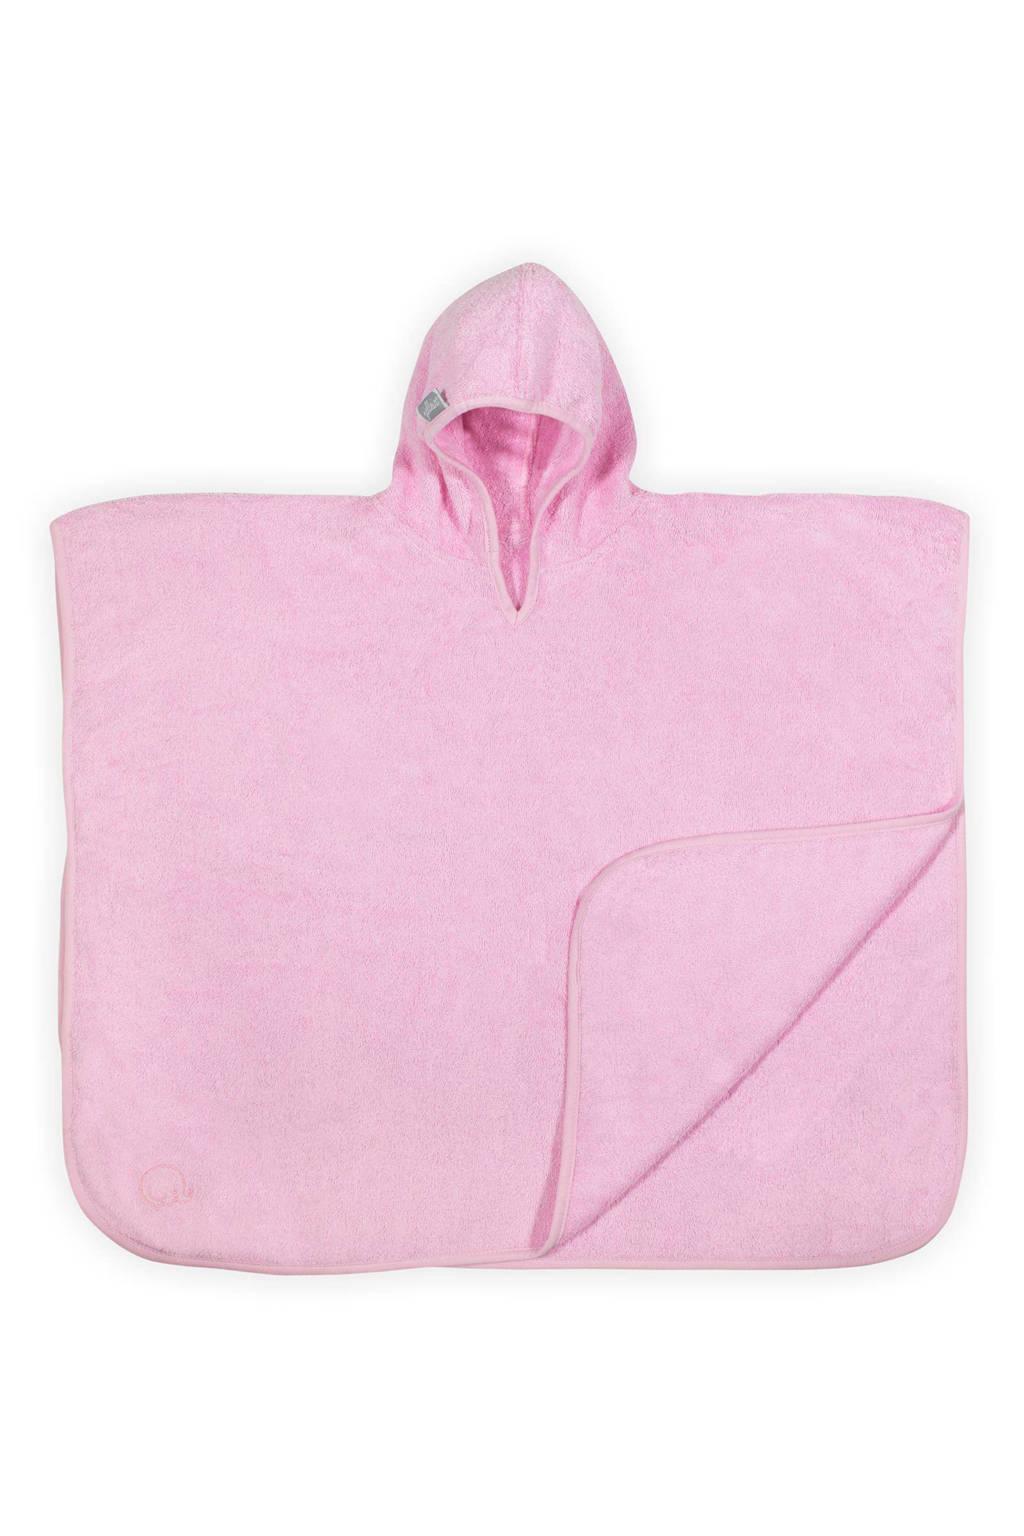 Jollein Basic care badponcho 70x60 cm lichtroze, Lichtroze